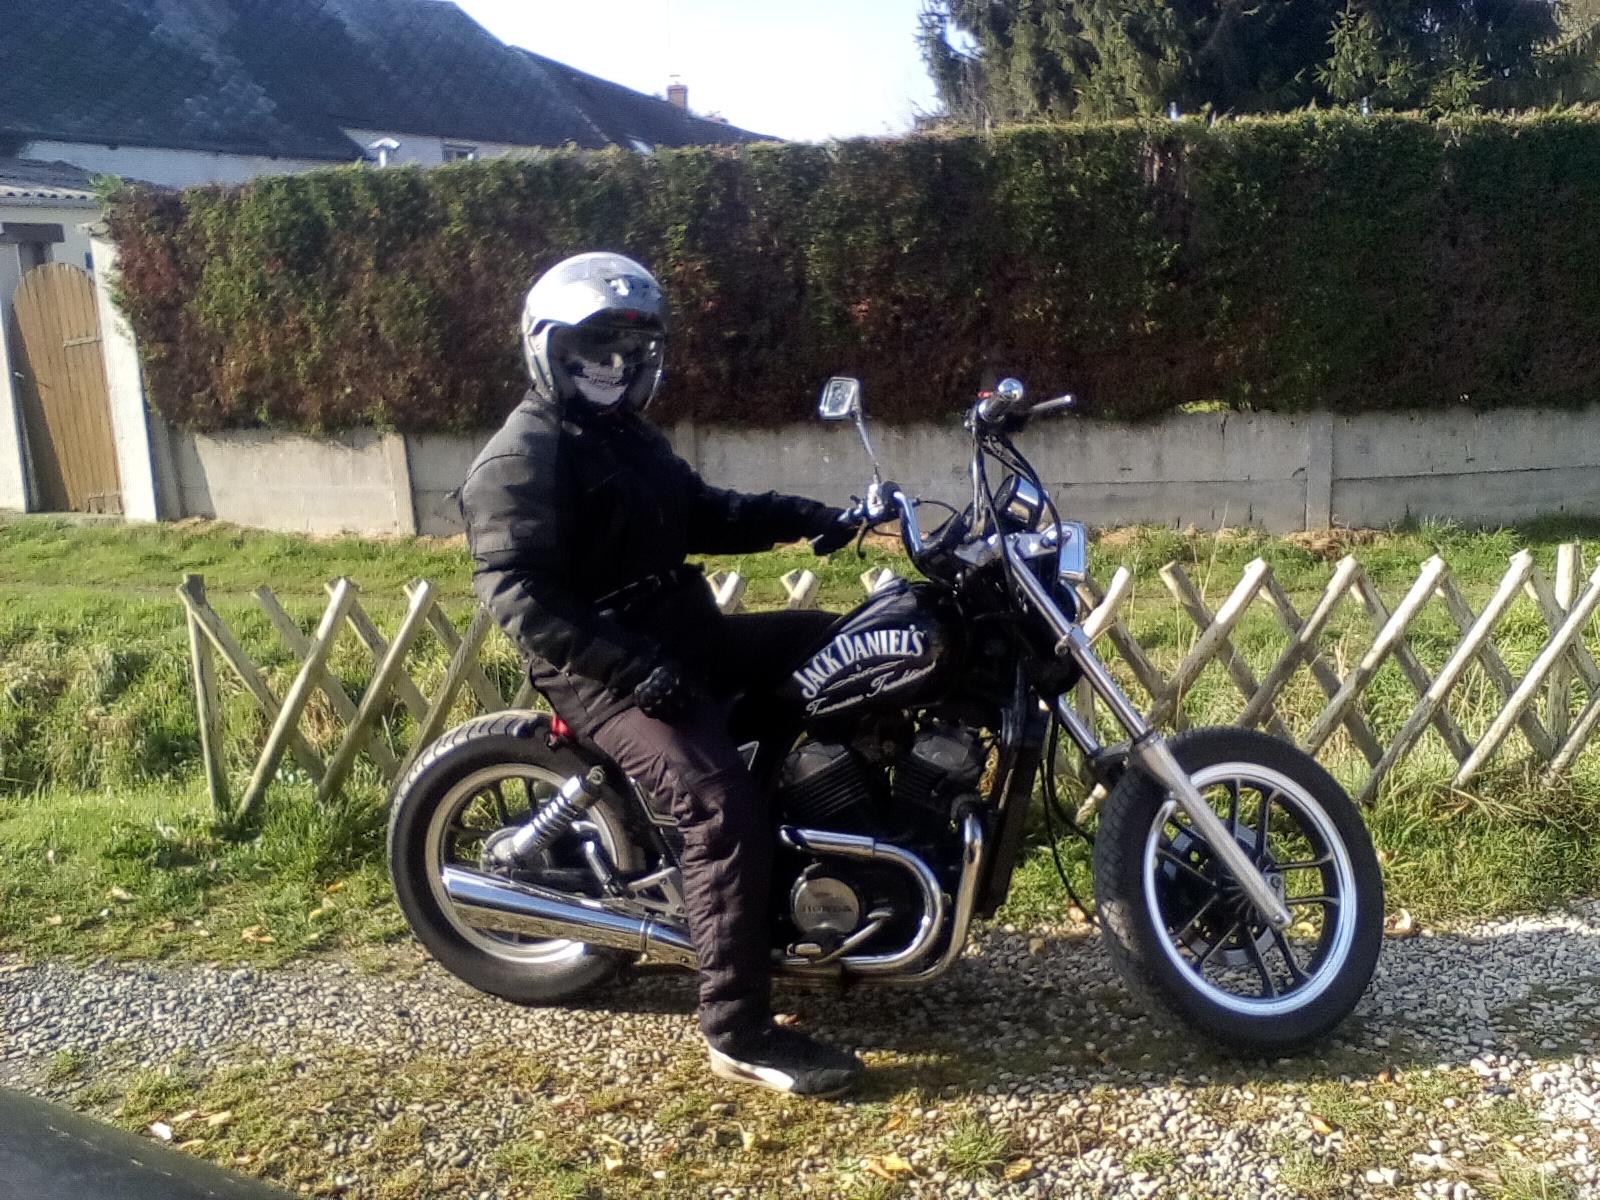 vt500c  transformation  en bobber, mes motos Deauville, Shadow 600 905323IMG20161105123025